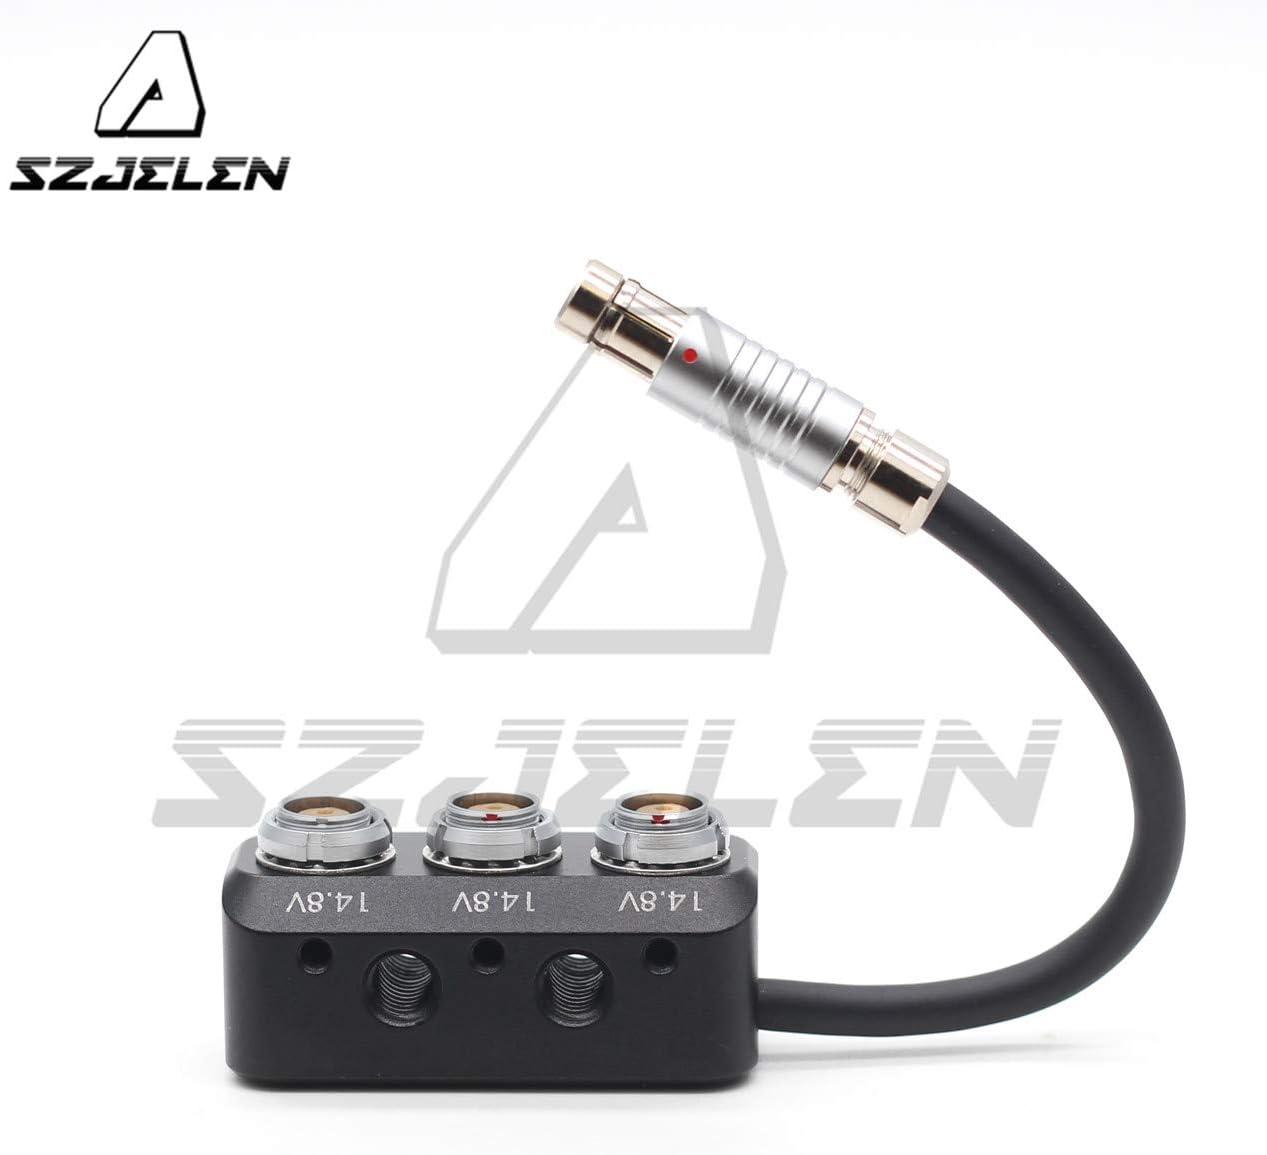 Hirose 4PIN to 2PIN SZJELEN Hirose 4pin to 0B 2pin Female Power Splitter for Camera Power Supply 2Pin Power Splitter Cable